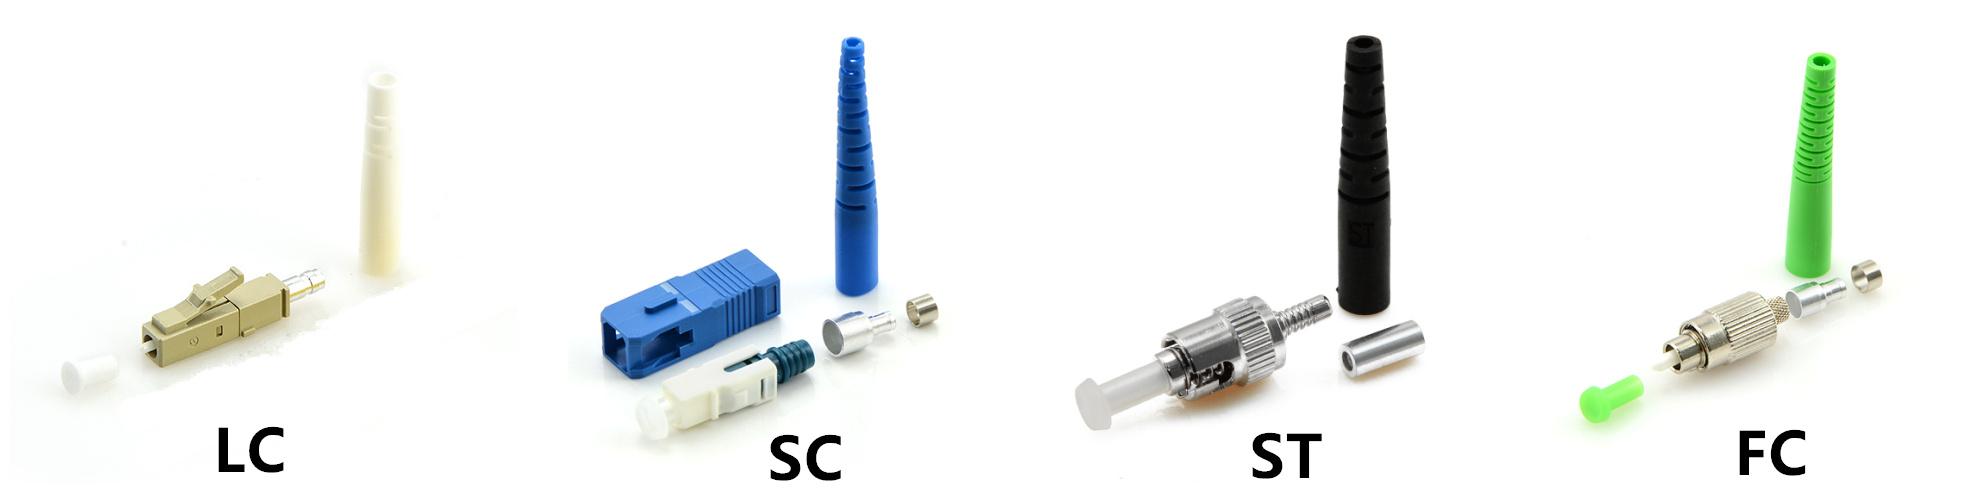 common-fiber-optic-connector